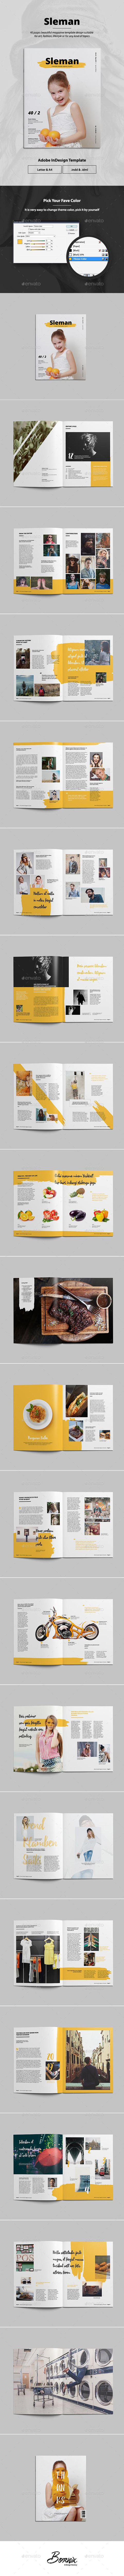 Sleman Modern Magazine Template - Magazines Print Templates